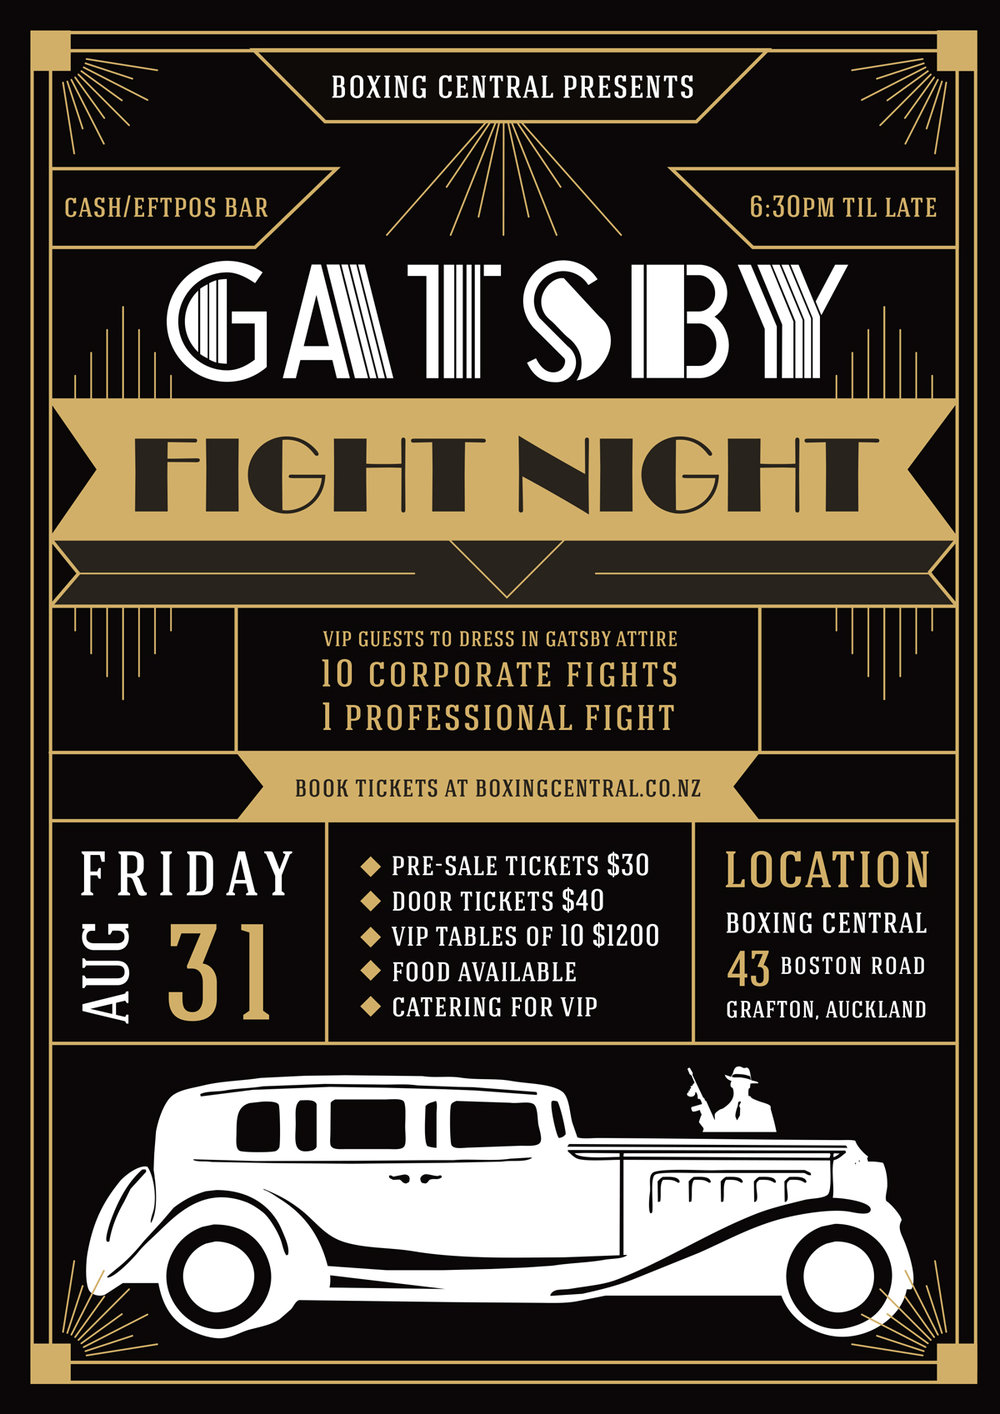 gatsby-poster-web.jpg